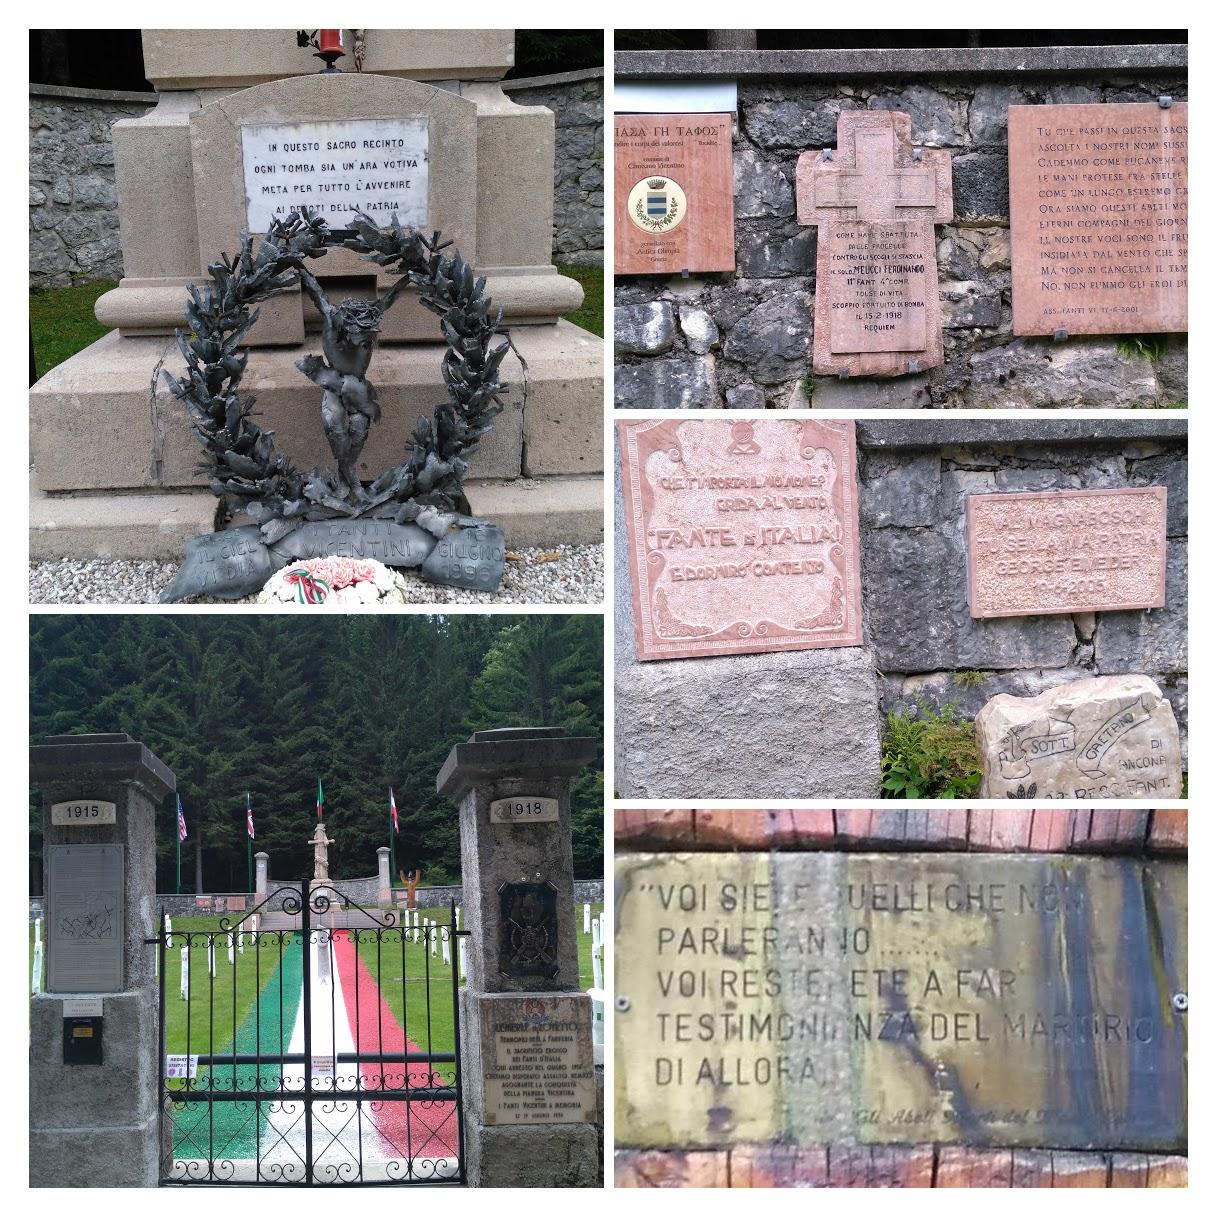 italiainpiega-evento-la grande guerra 2018-cimitero italo austriaco cesuna 2